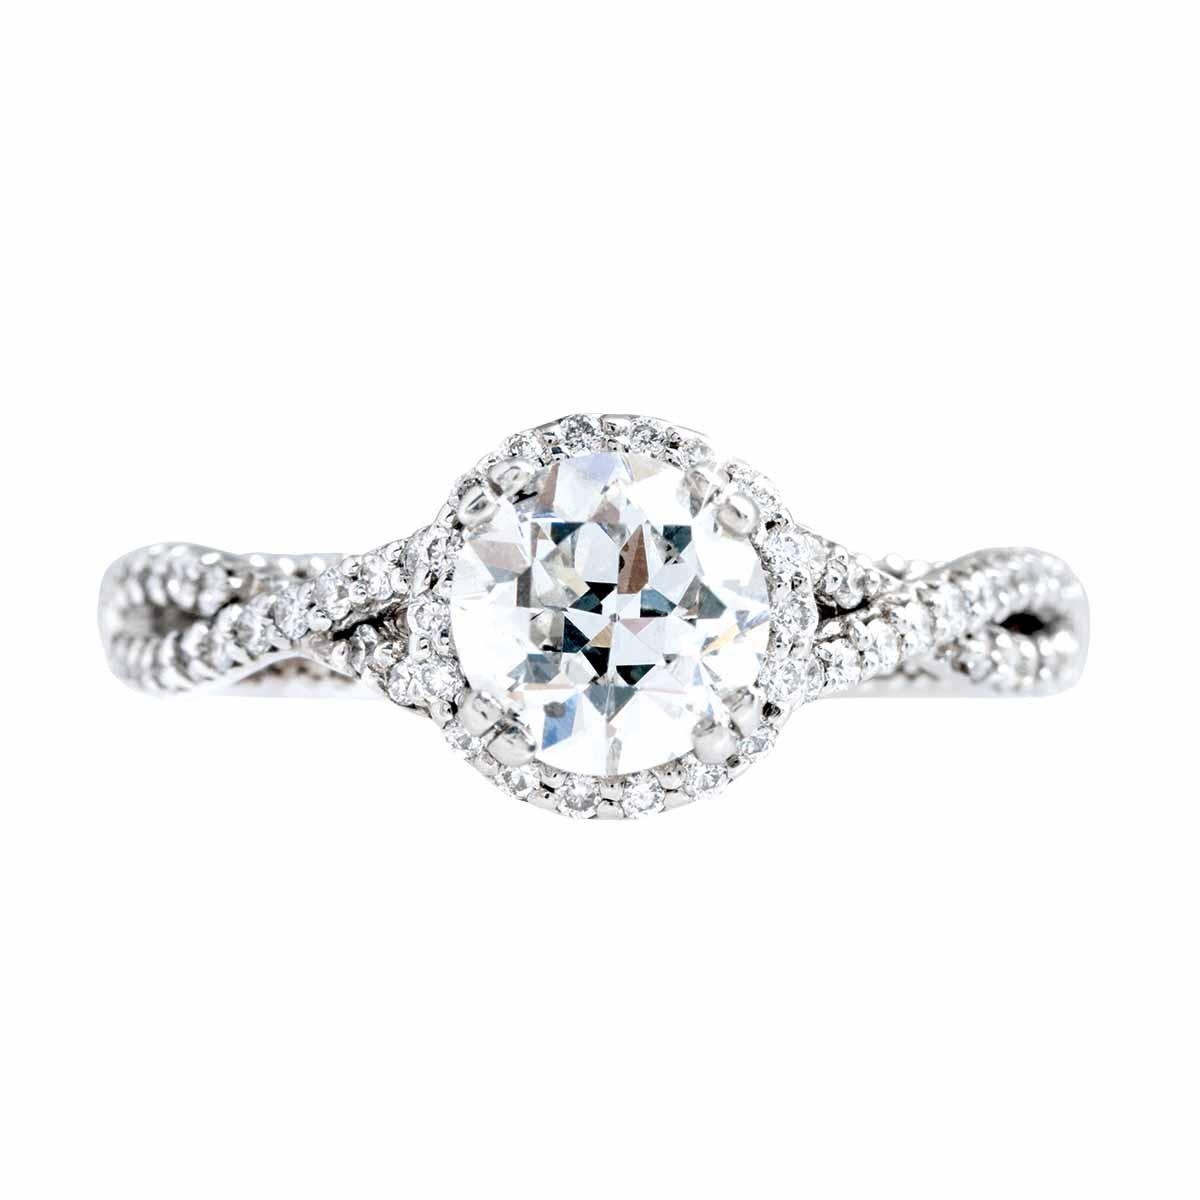 Vintage Verragio 1.21 CTW Diamond Parisian Collection Engagement Ring